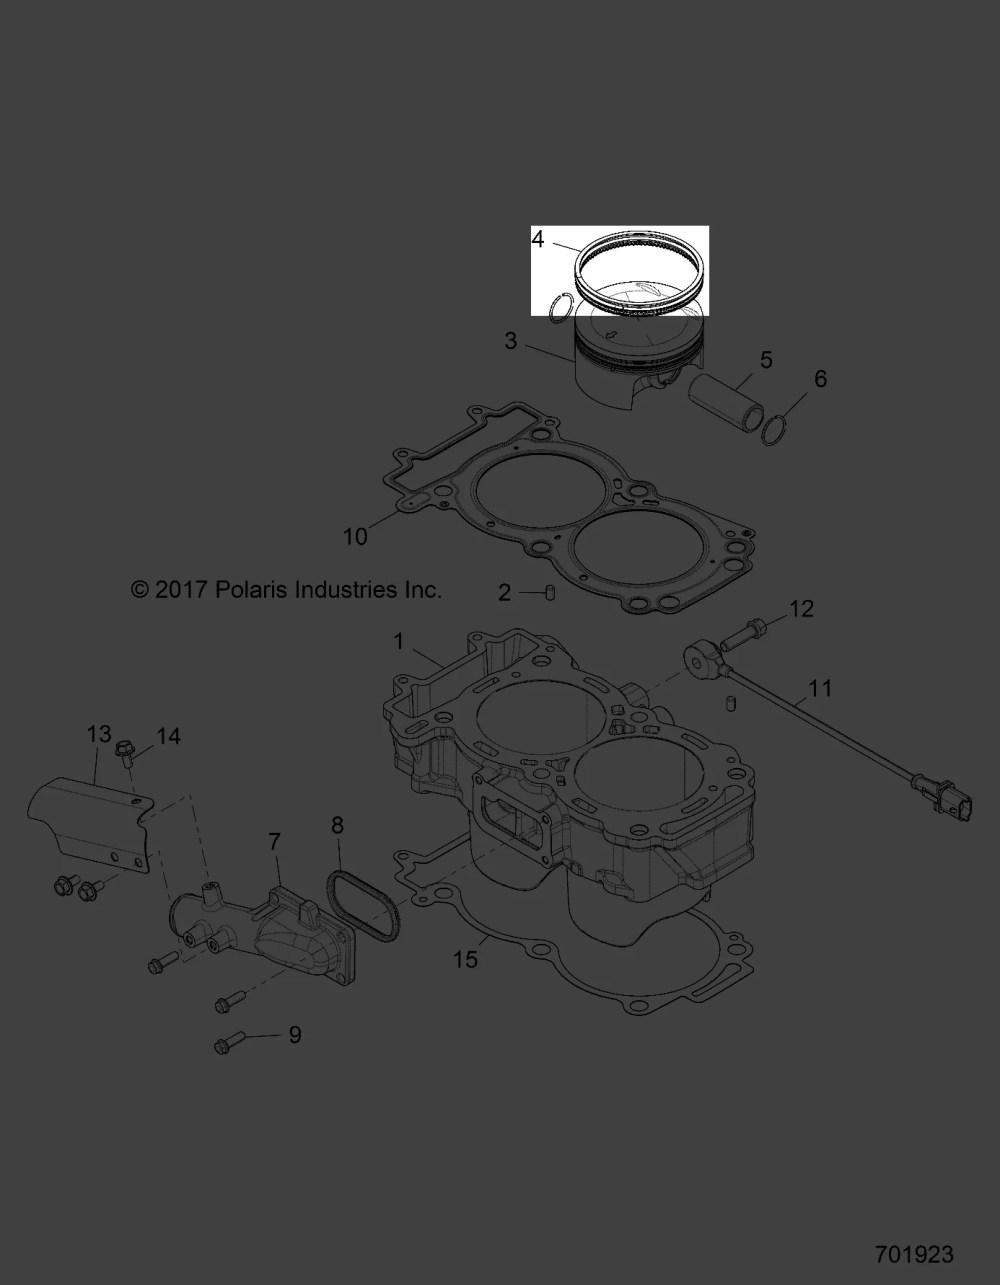 medium resolution of polaris 2016 2018 rzr xp4 turbo md rzr xp4 turbo intl k piston rings 2206217 new oem walmart com